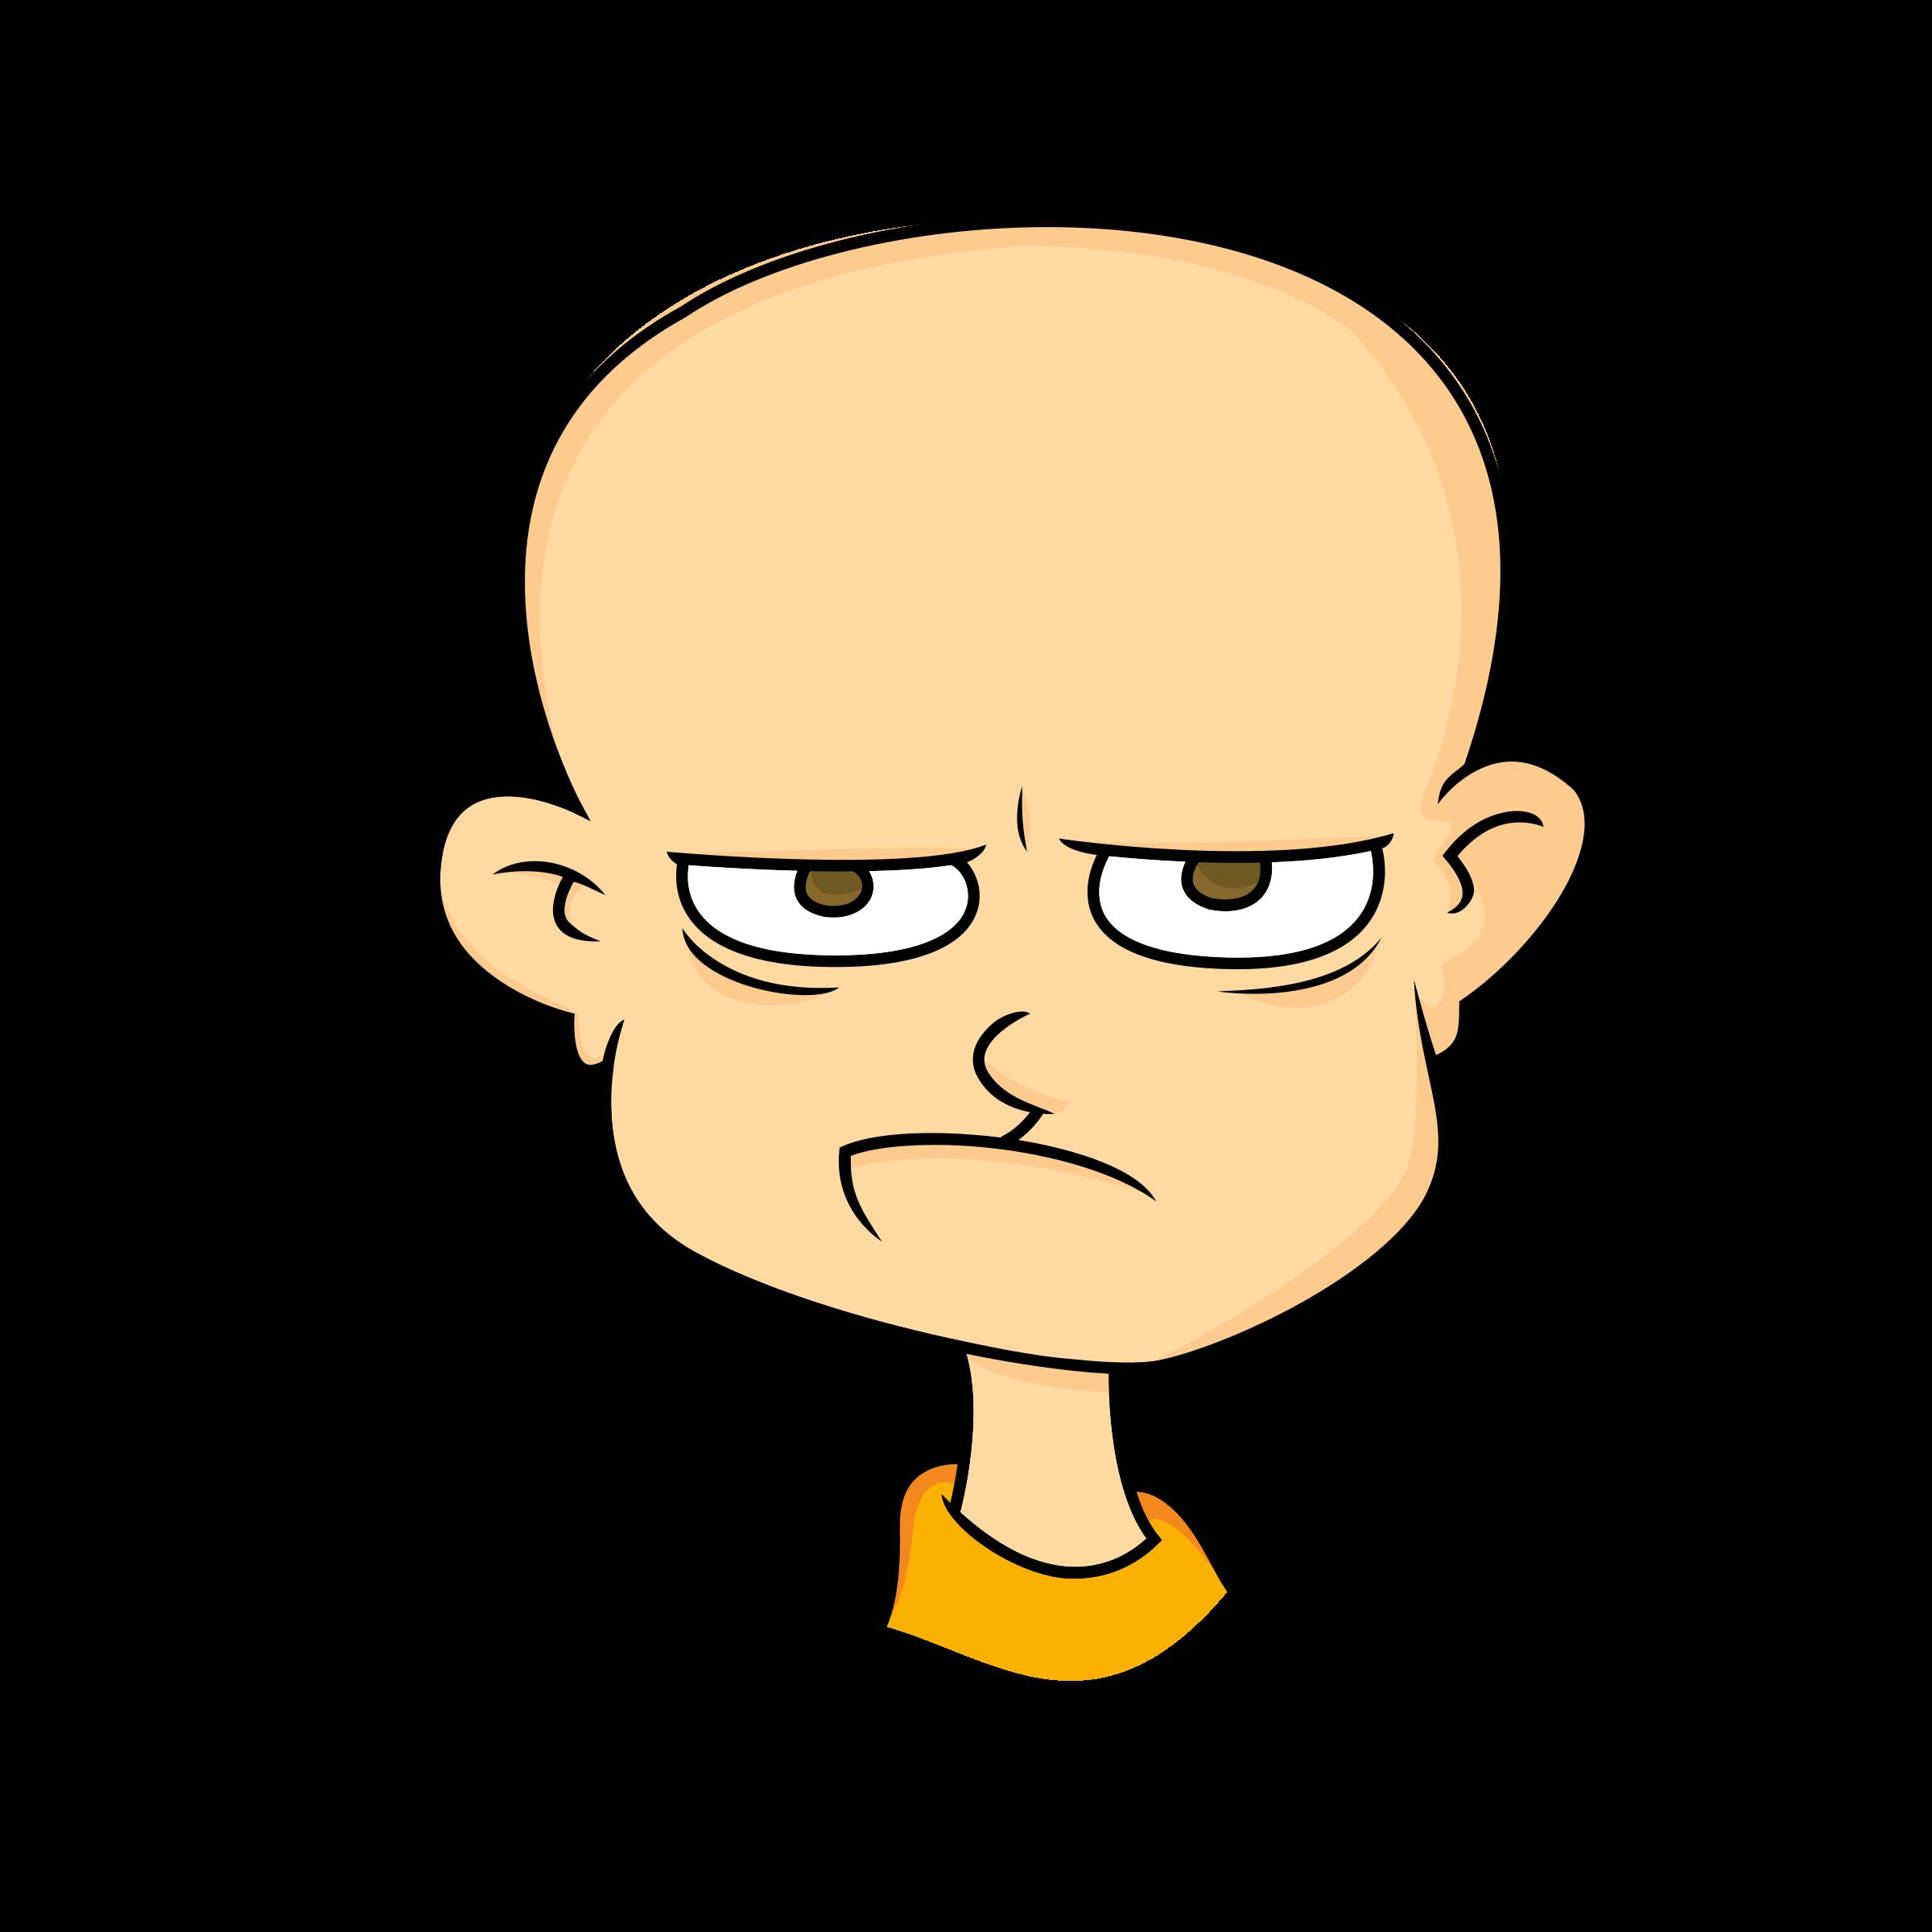 2400x2400 Png Grumpy Face Transparent Grumpy Face.png Images. Pluspng